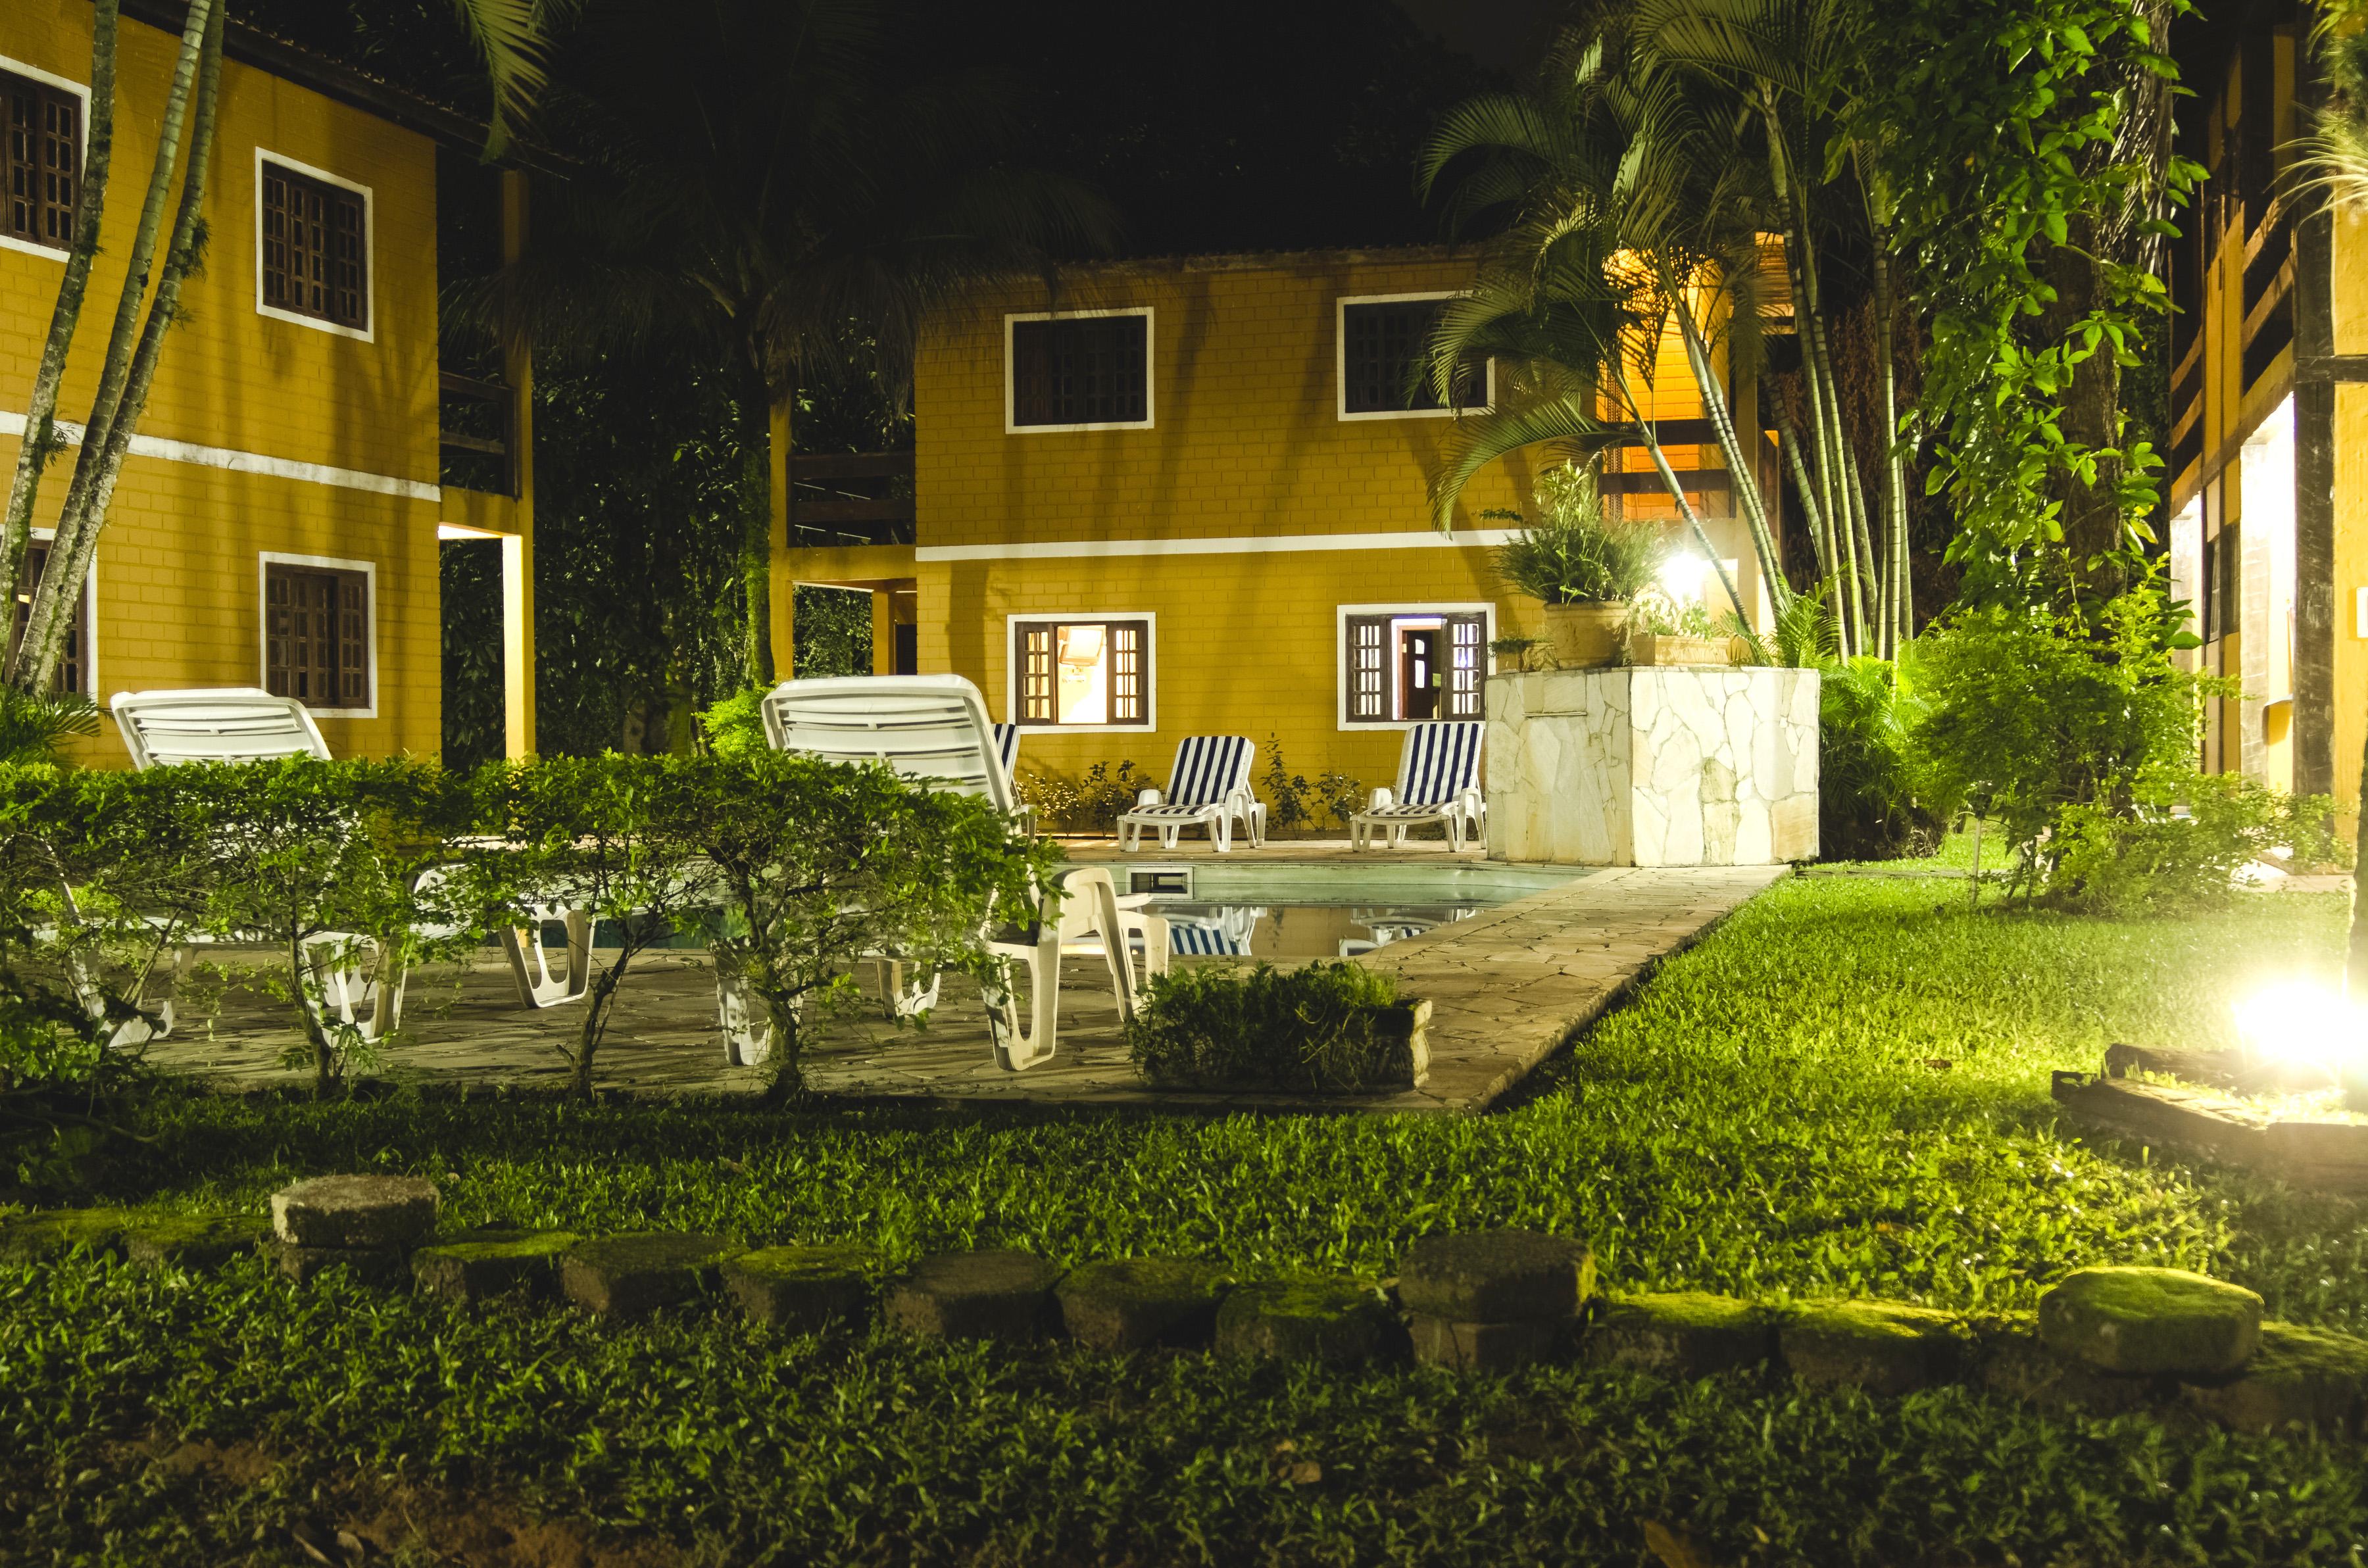 Noite | Condomínio Boiçucanga